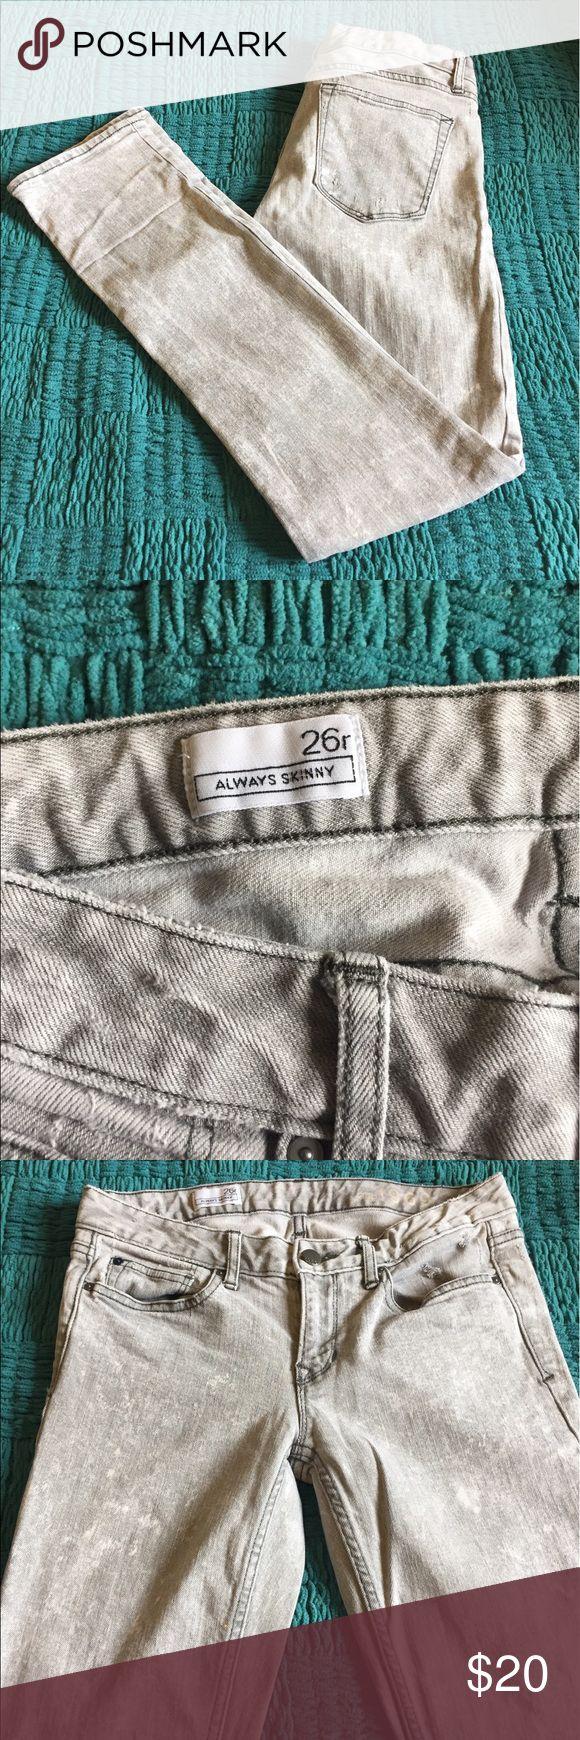 Gap 'Always Skinny' acid wash jeans Great condition! GAP Jeans Straight Leg